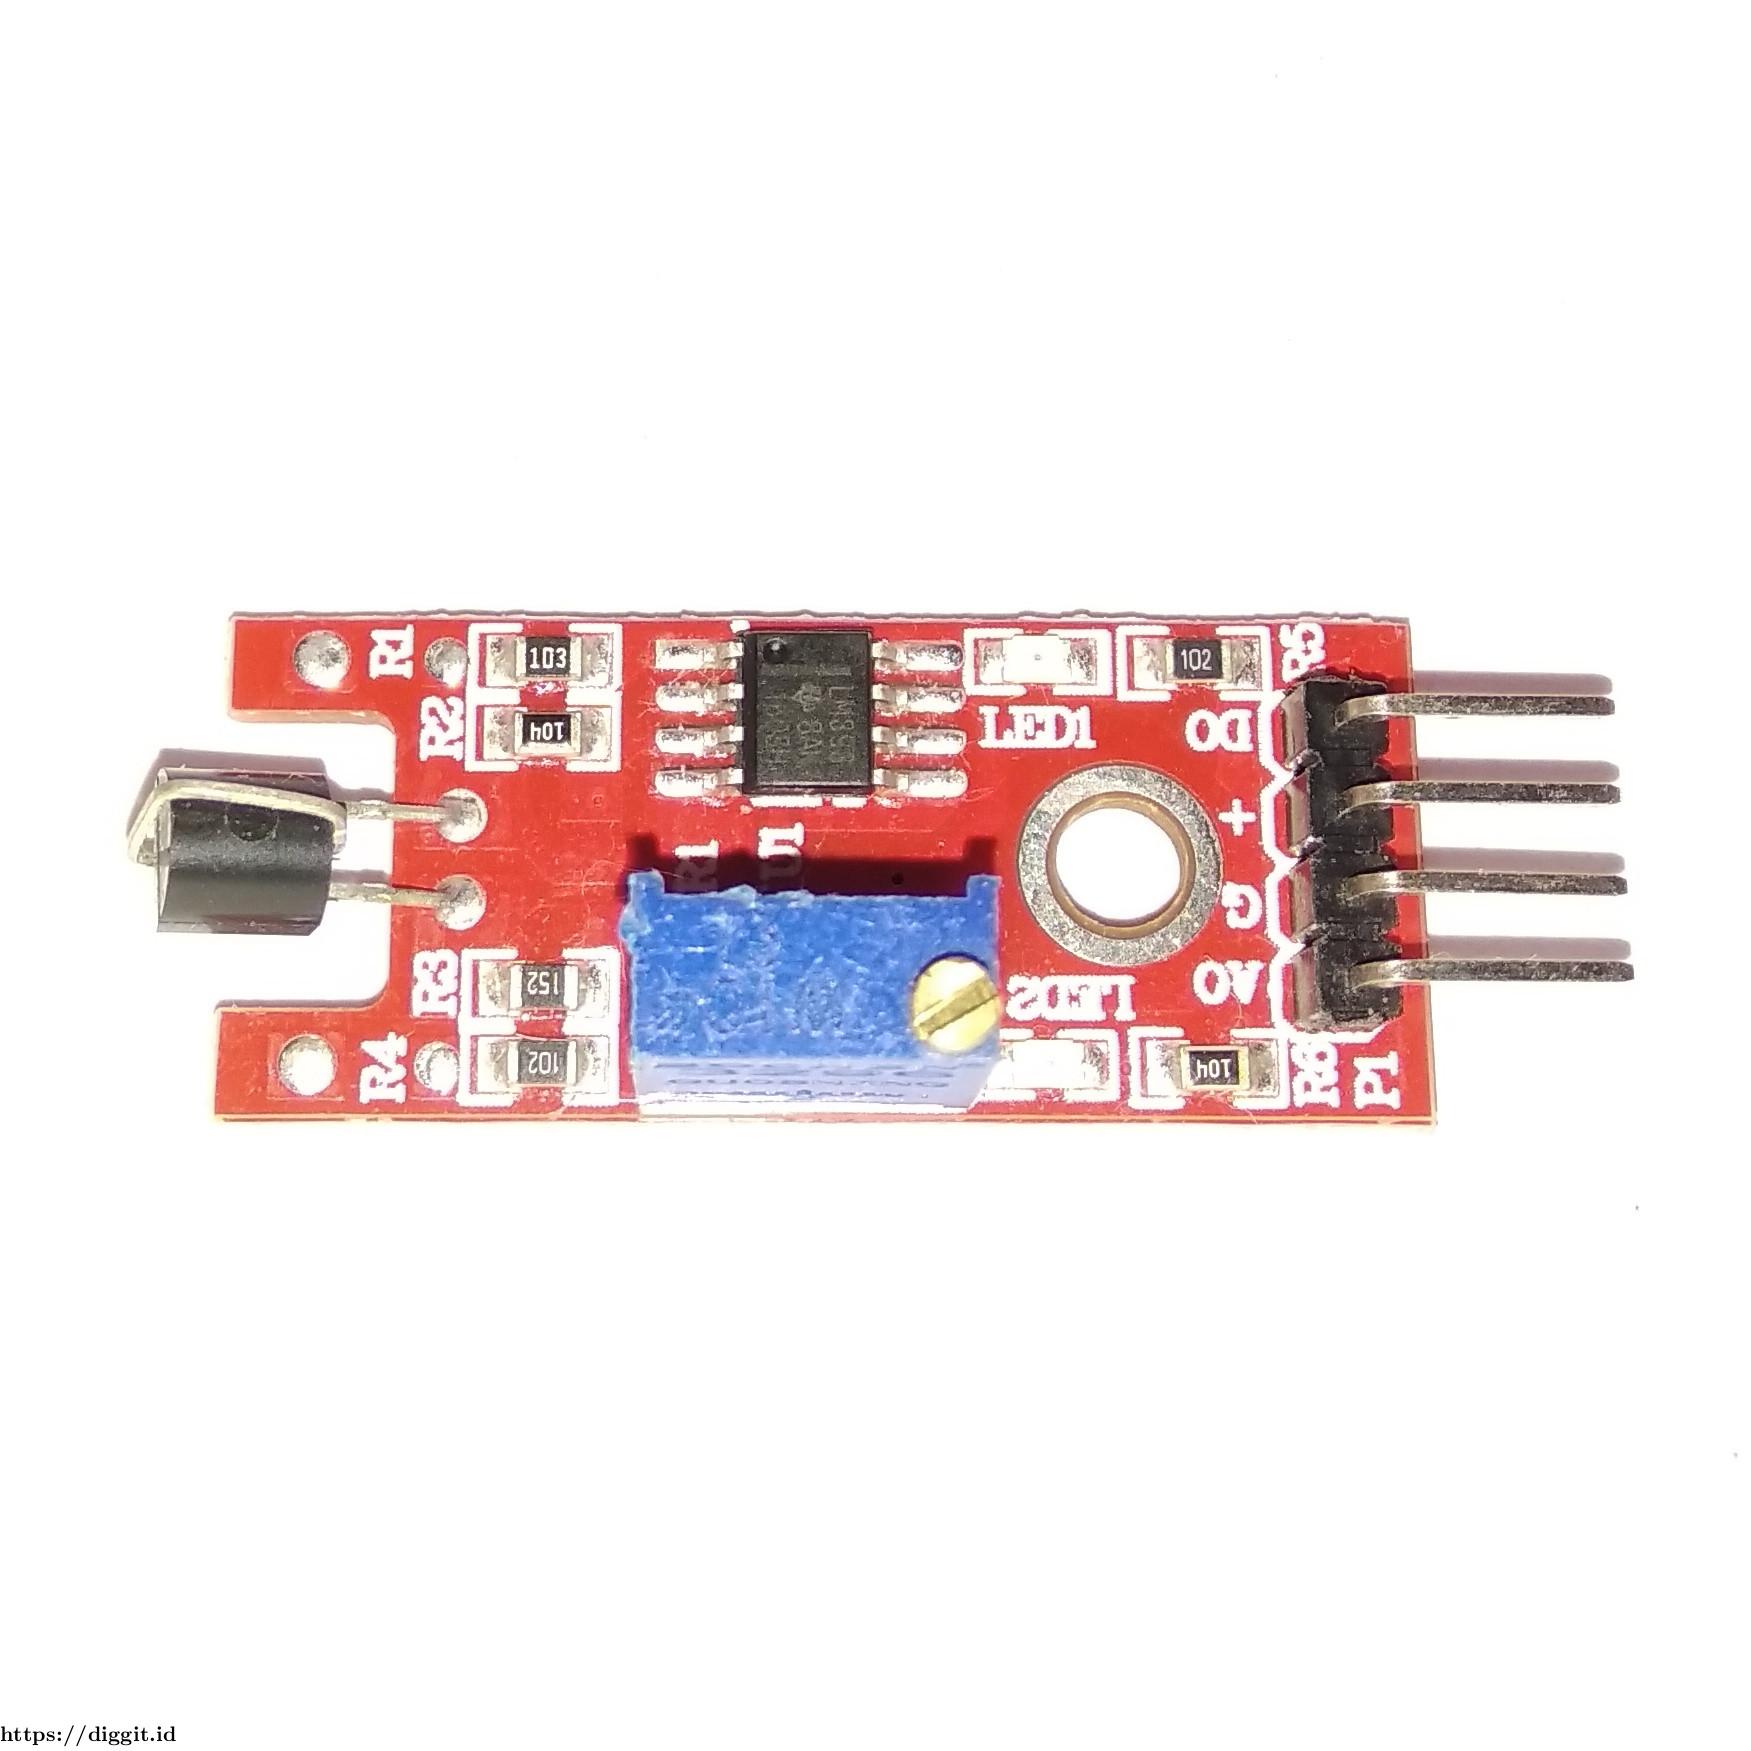 Gambar 1 Metal touch sensor module KY-036